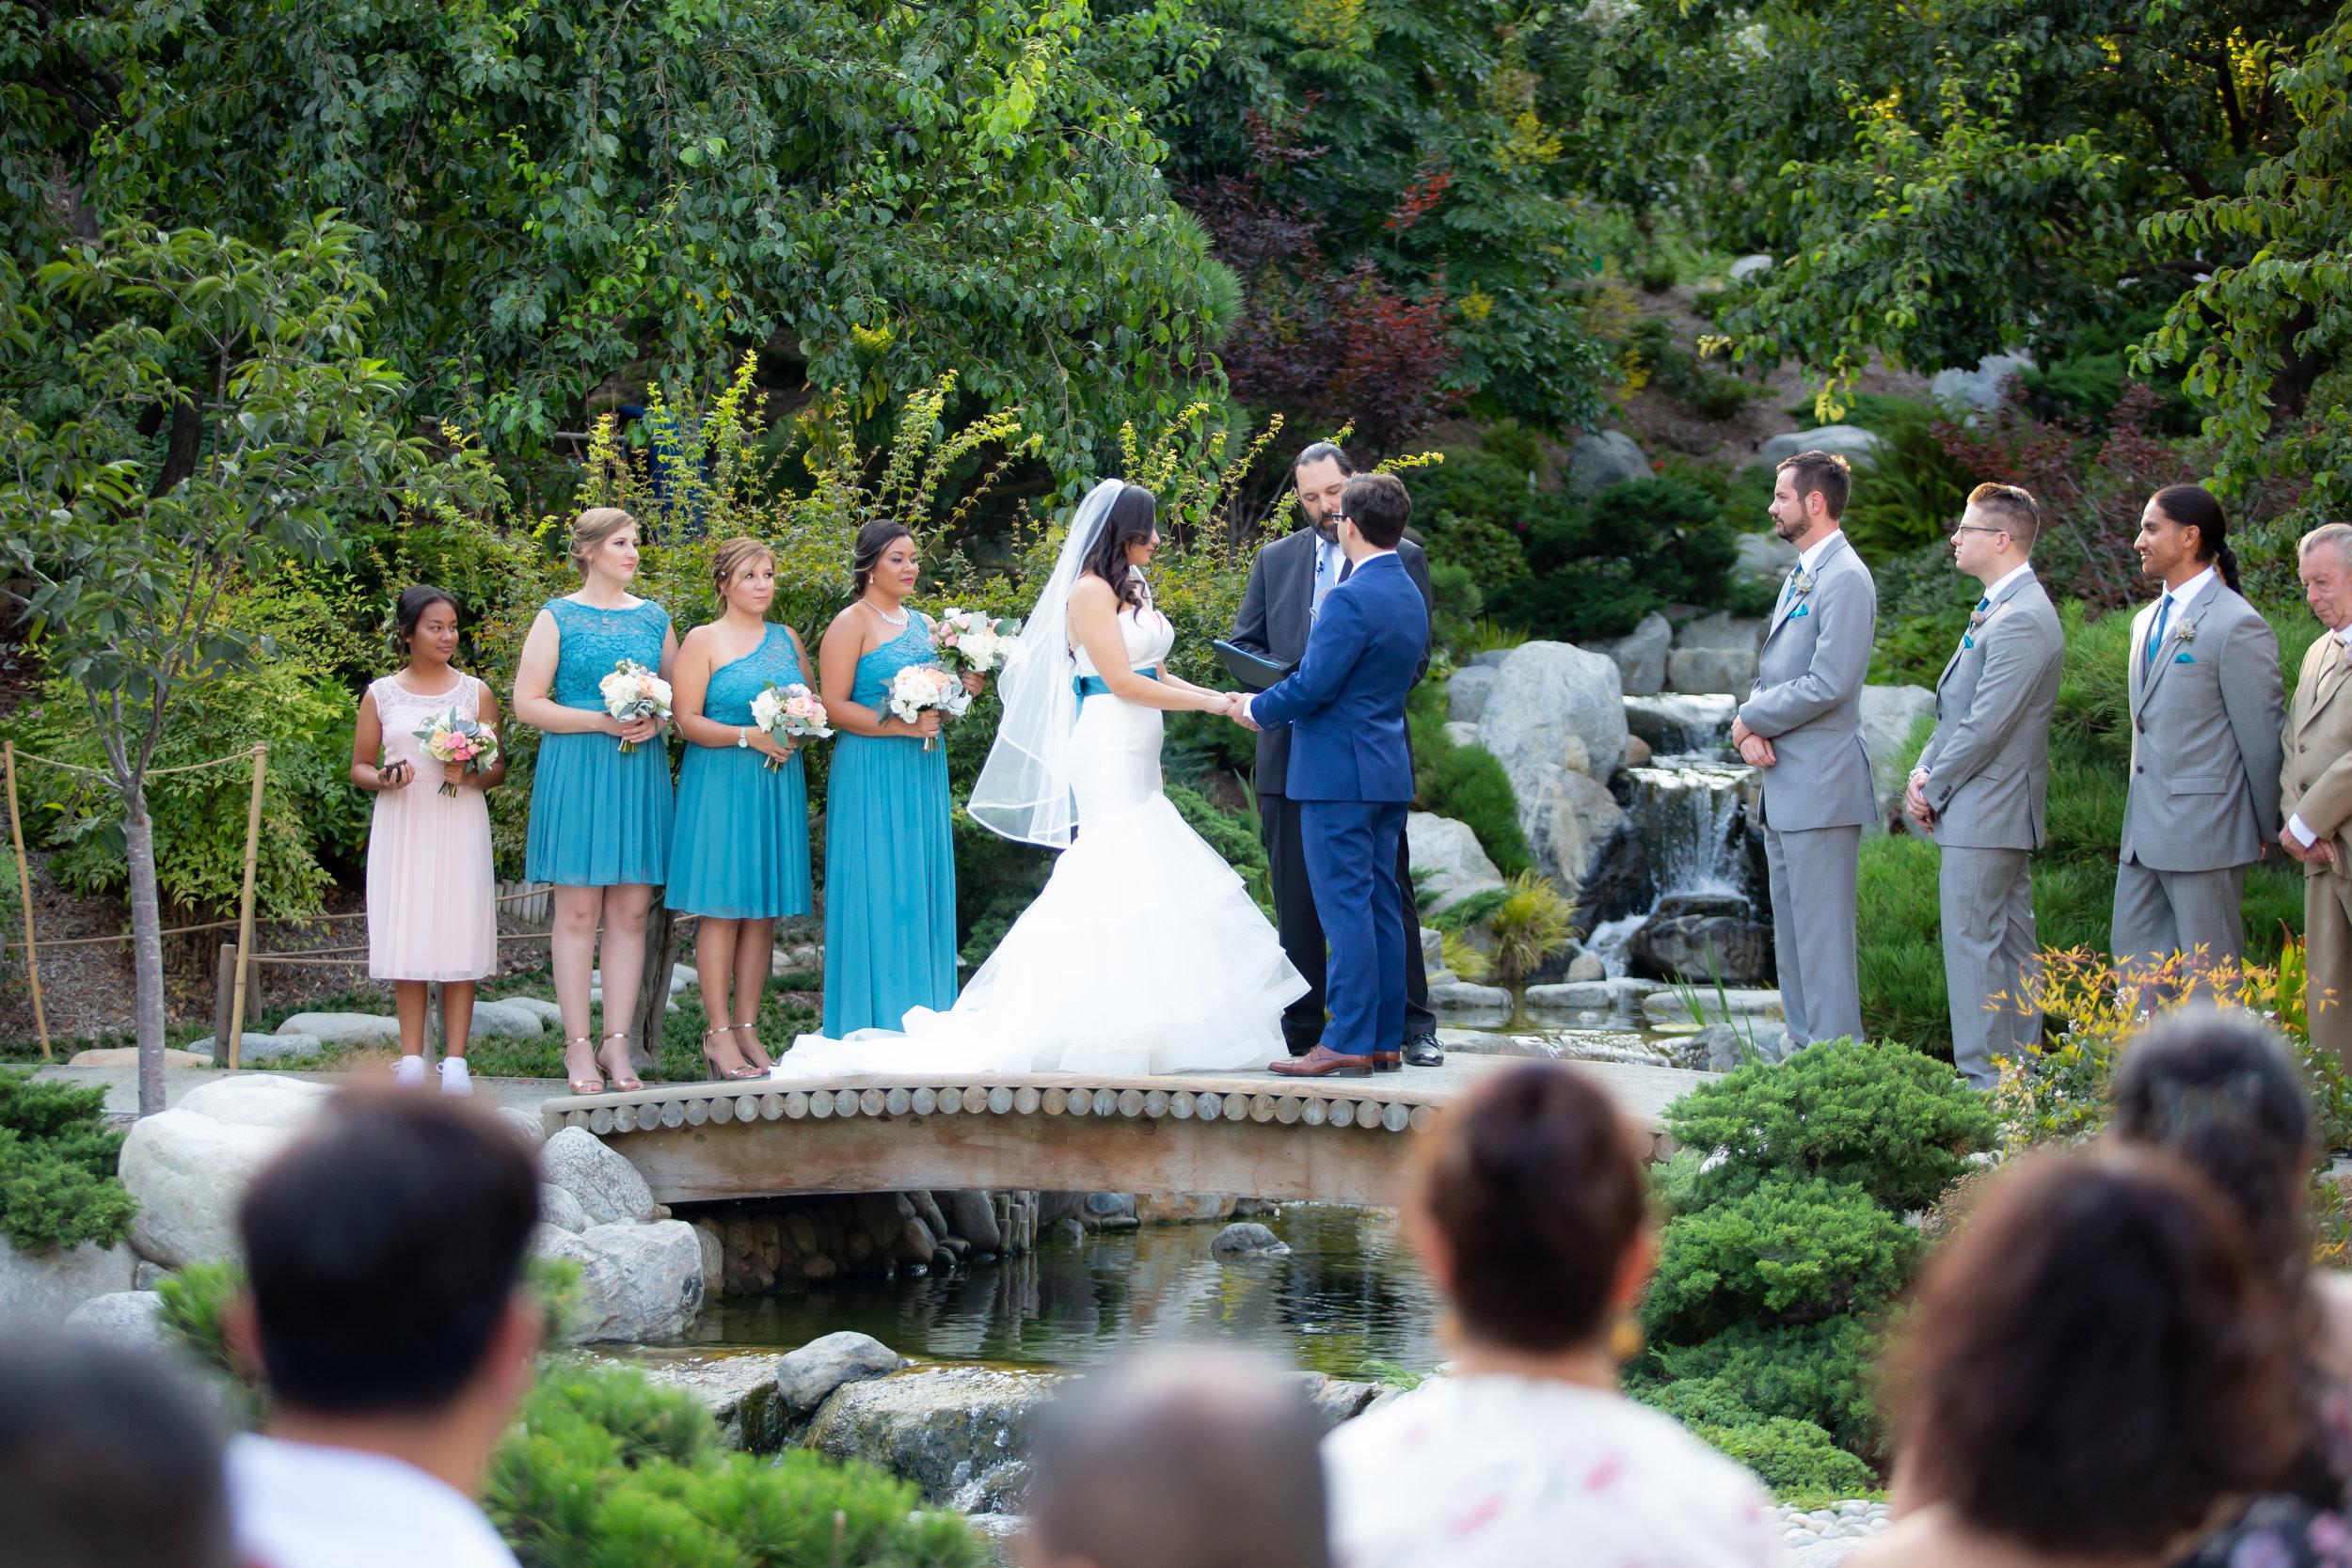 San-Diego-Wedding-Japanese-Friendship-Garden-Carla-David-2018-185.jpg